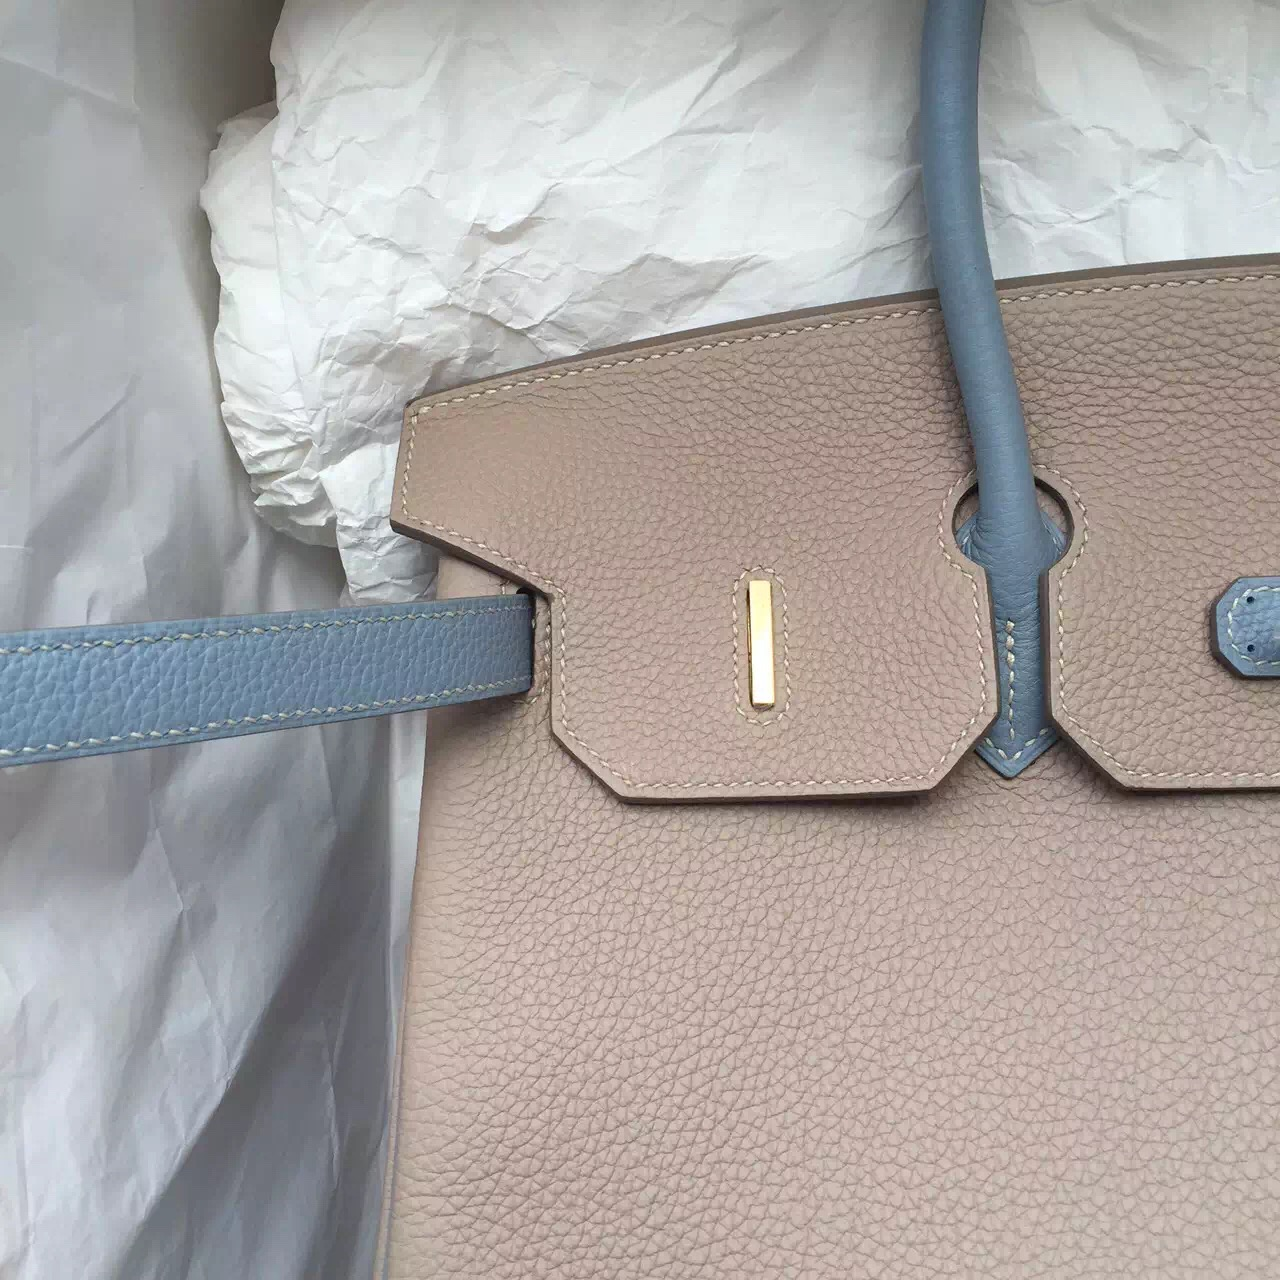 Hand Stitching Gris Tourterelle/J7 Blue Lin Togo Calfskin Leather Hermes Birkin Bag 35CM